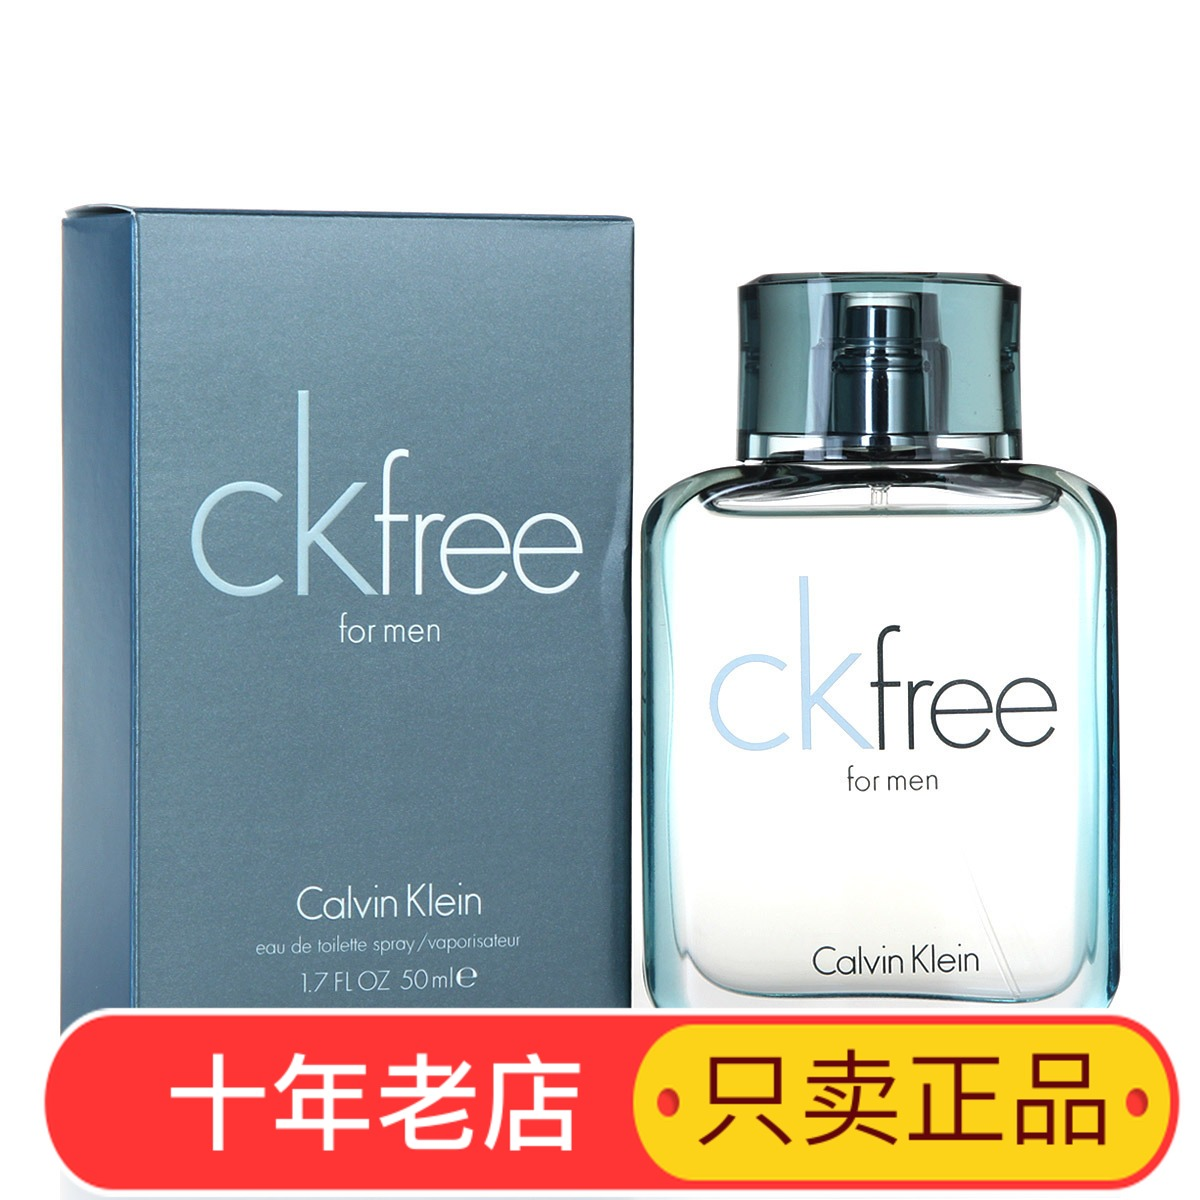 CKFree凯文克莱ck自由男士持久淡香水50/100ML正品包邮古龙水礼盒图片